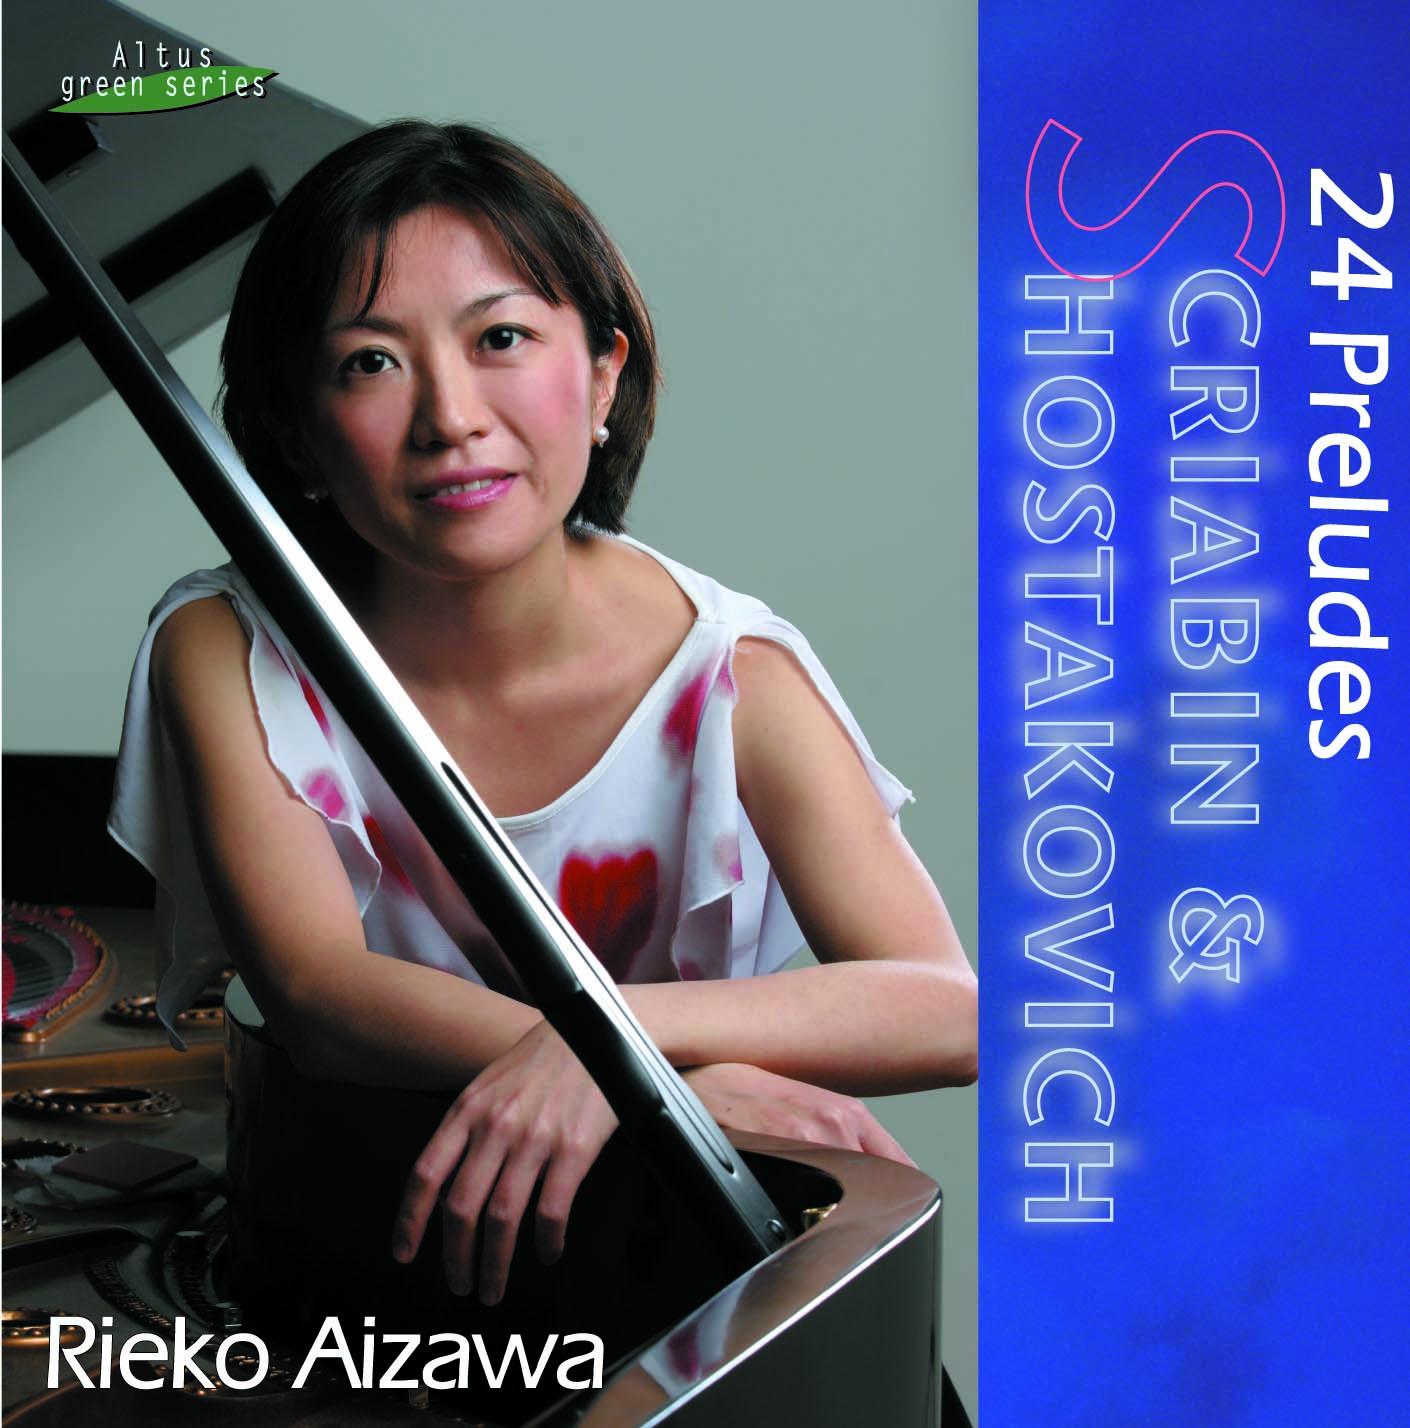 Rieko Aizawa (Pf) - Scriabin & Shostakovich : 24 Preludes